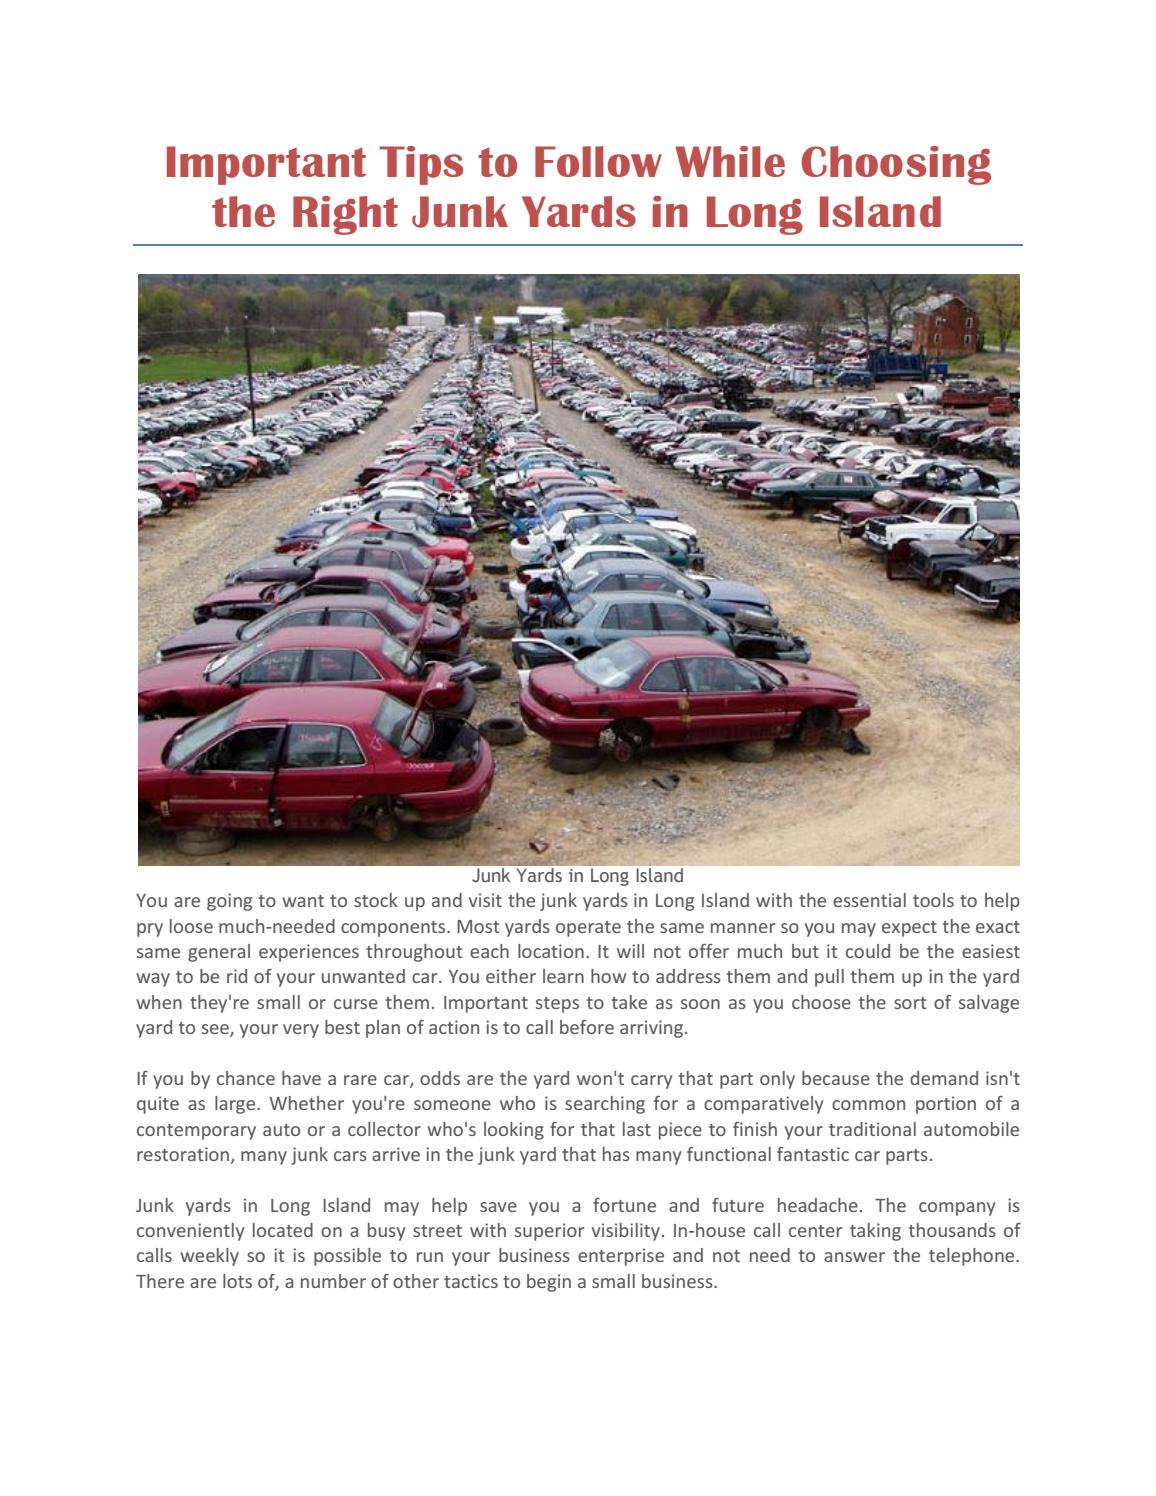 Junk yards in long island by Jiffy Junk - issuu